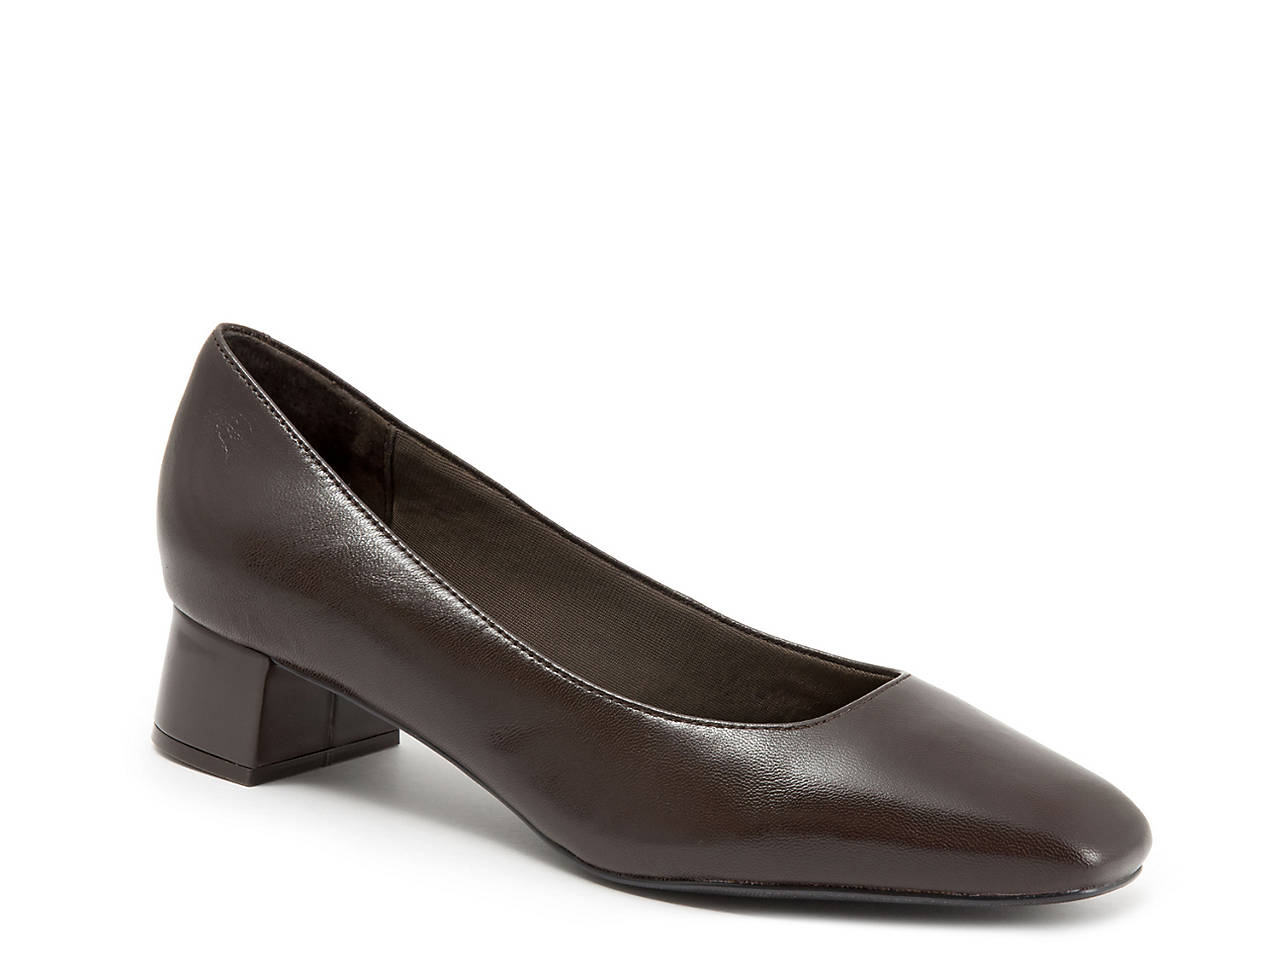 0bf3f6b5b4d Trotters Lola Pump Women s Shoes